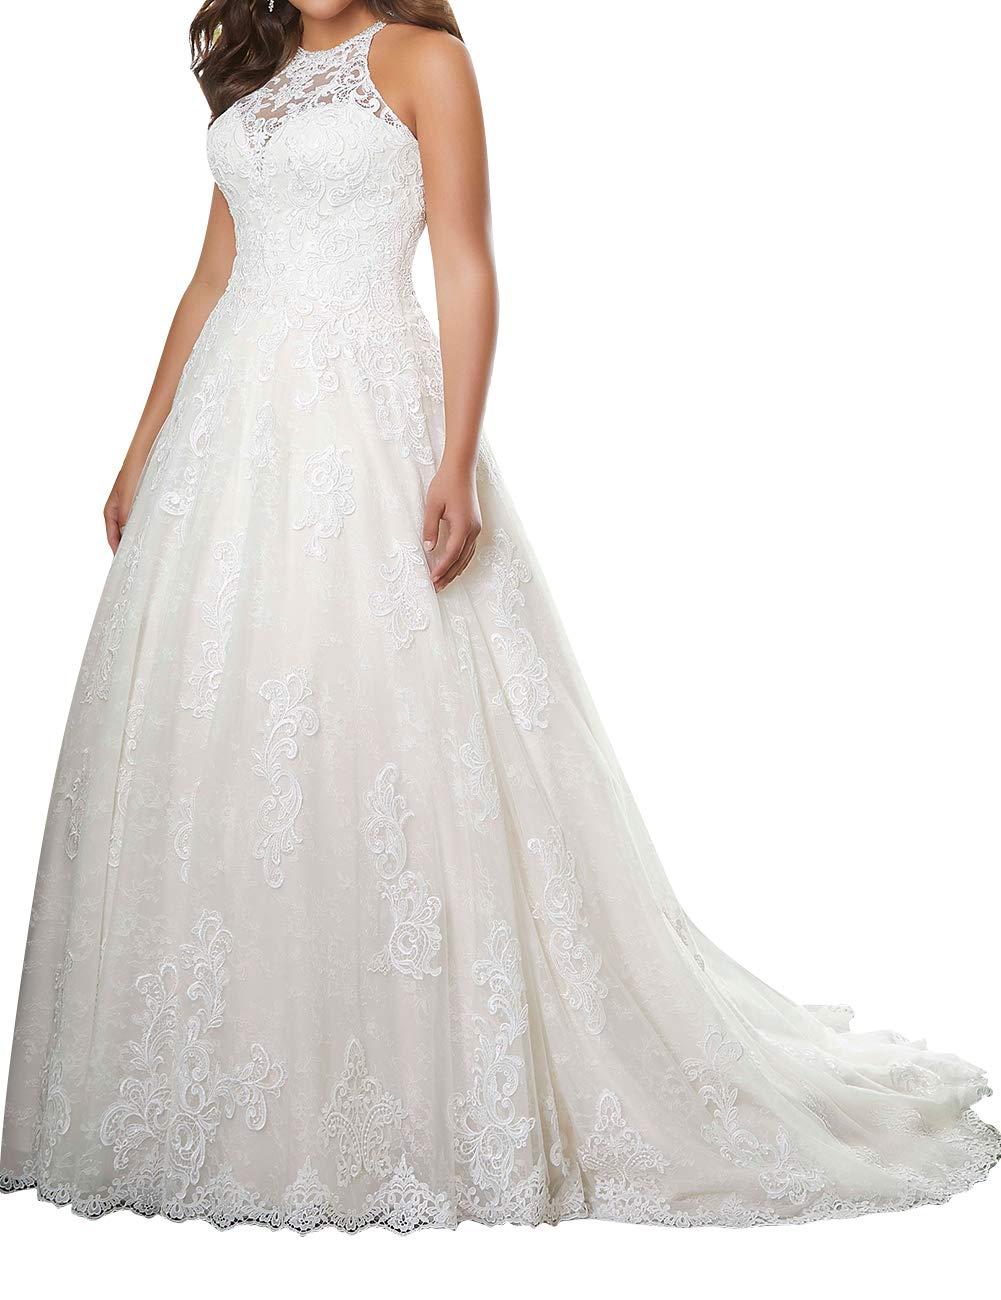 Wedding Dress Lace Bride Dresses Halter Wedding Gown Plus Size Wedding  Dresses A Line Bridal Gowns White